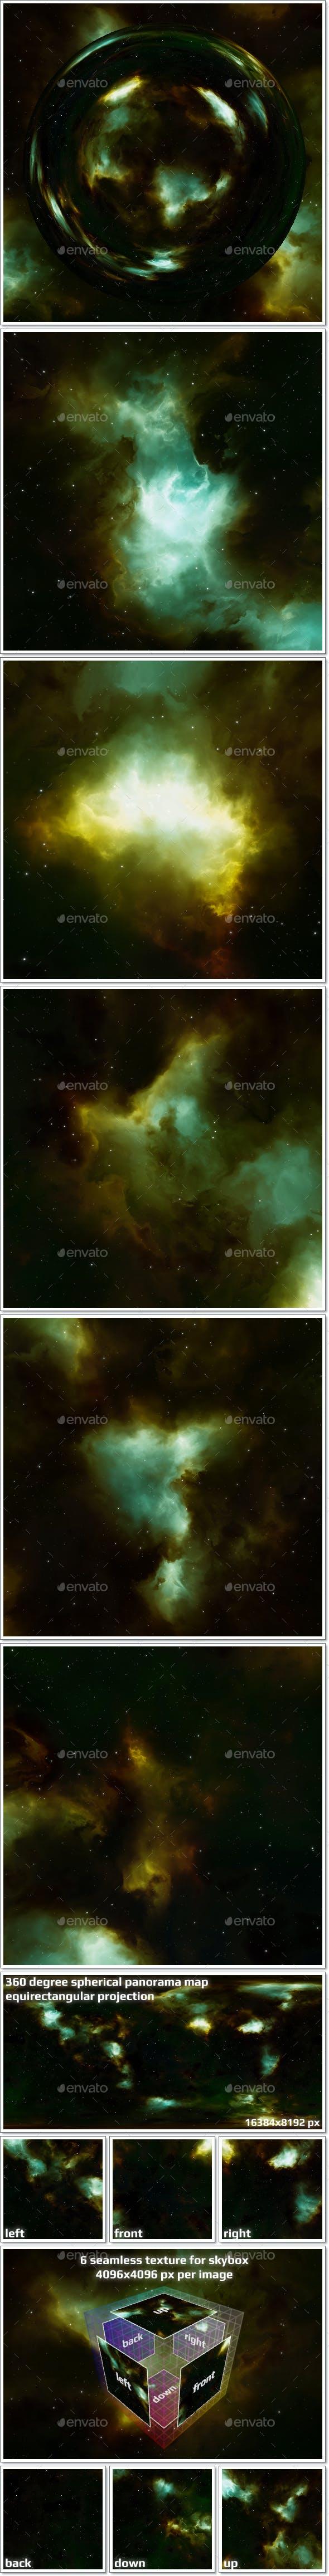 Nebula Space Environment HDRI Map 020 - 3DOcean Item for Sale